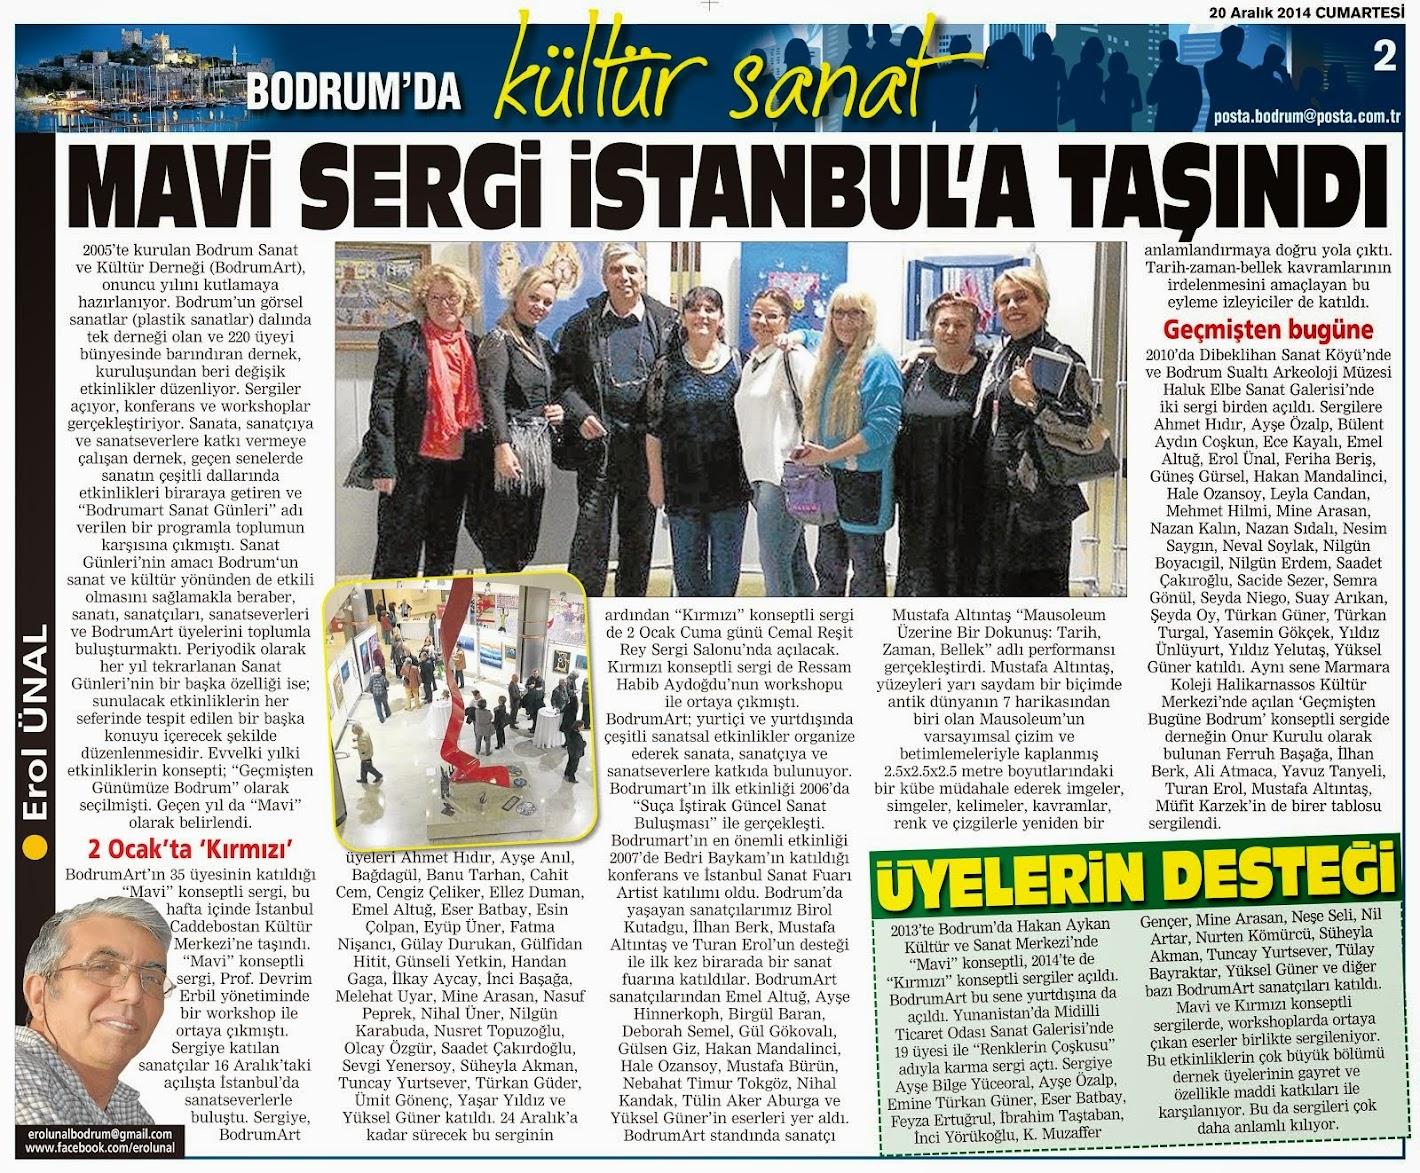 MAVİ SERGİ İSTANBUL'A TAŞINDI